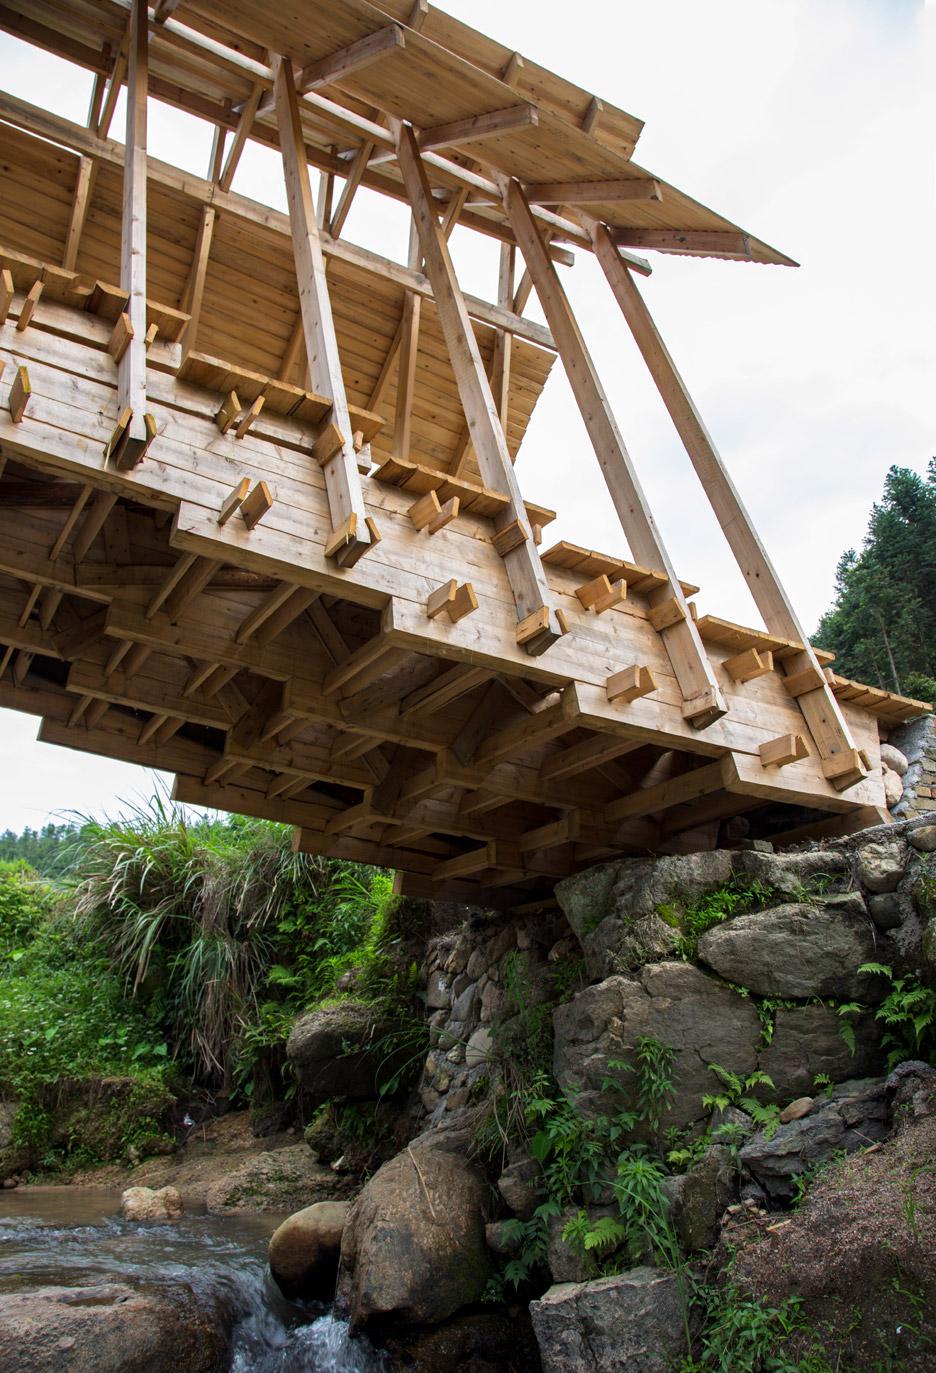 wind-rain-bridge-donn-holohan-peitian-southern-china_dezeen_936_2